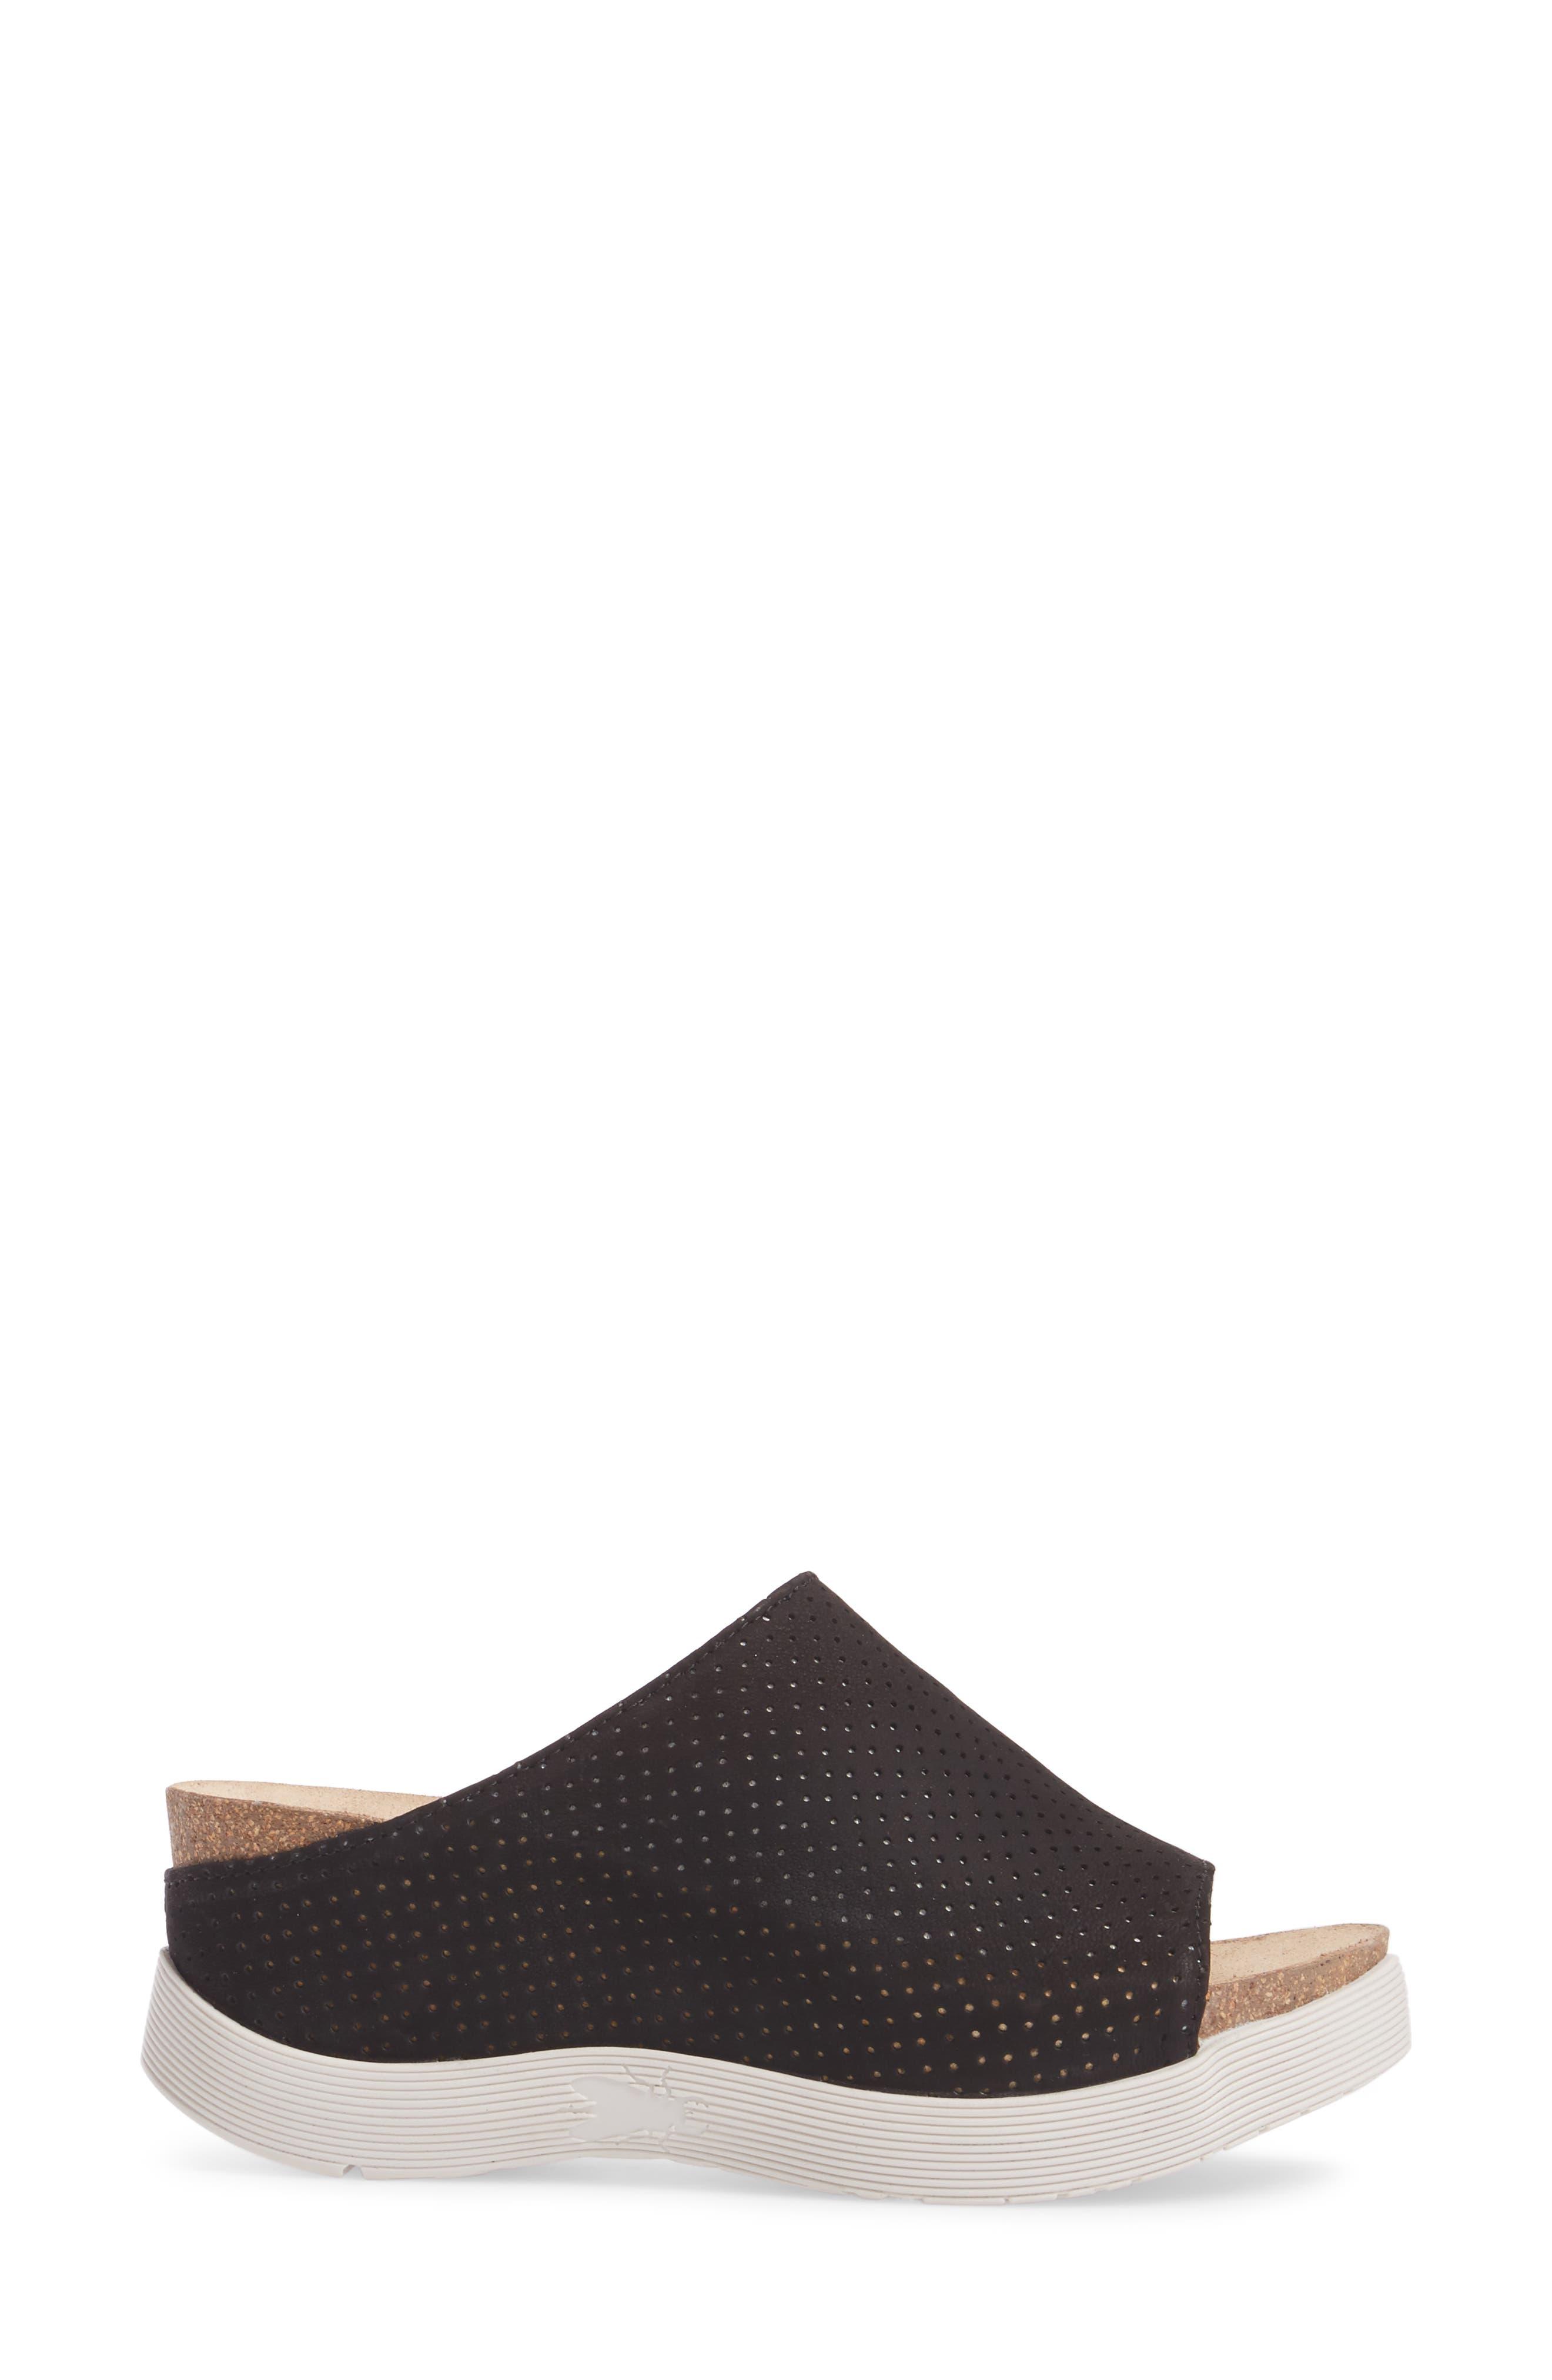 Whin Platform Sandal,                             Alternate thumbnail 3, color,                             BLACK CUPIDO LEATHER